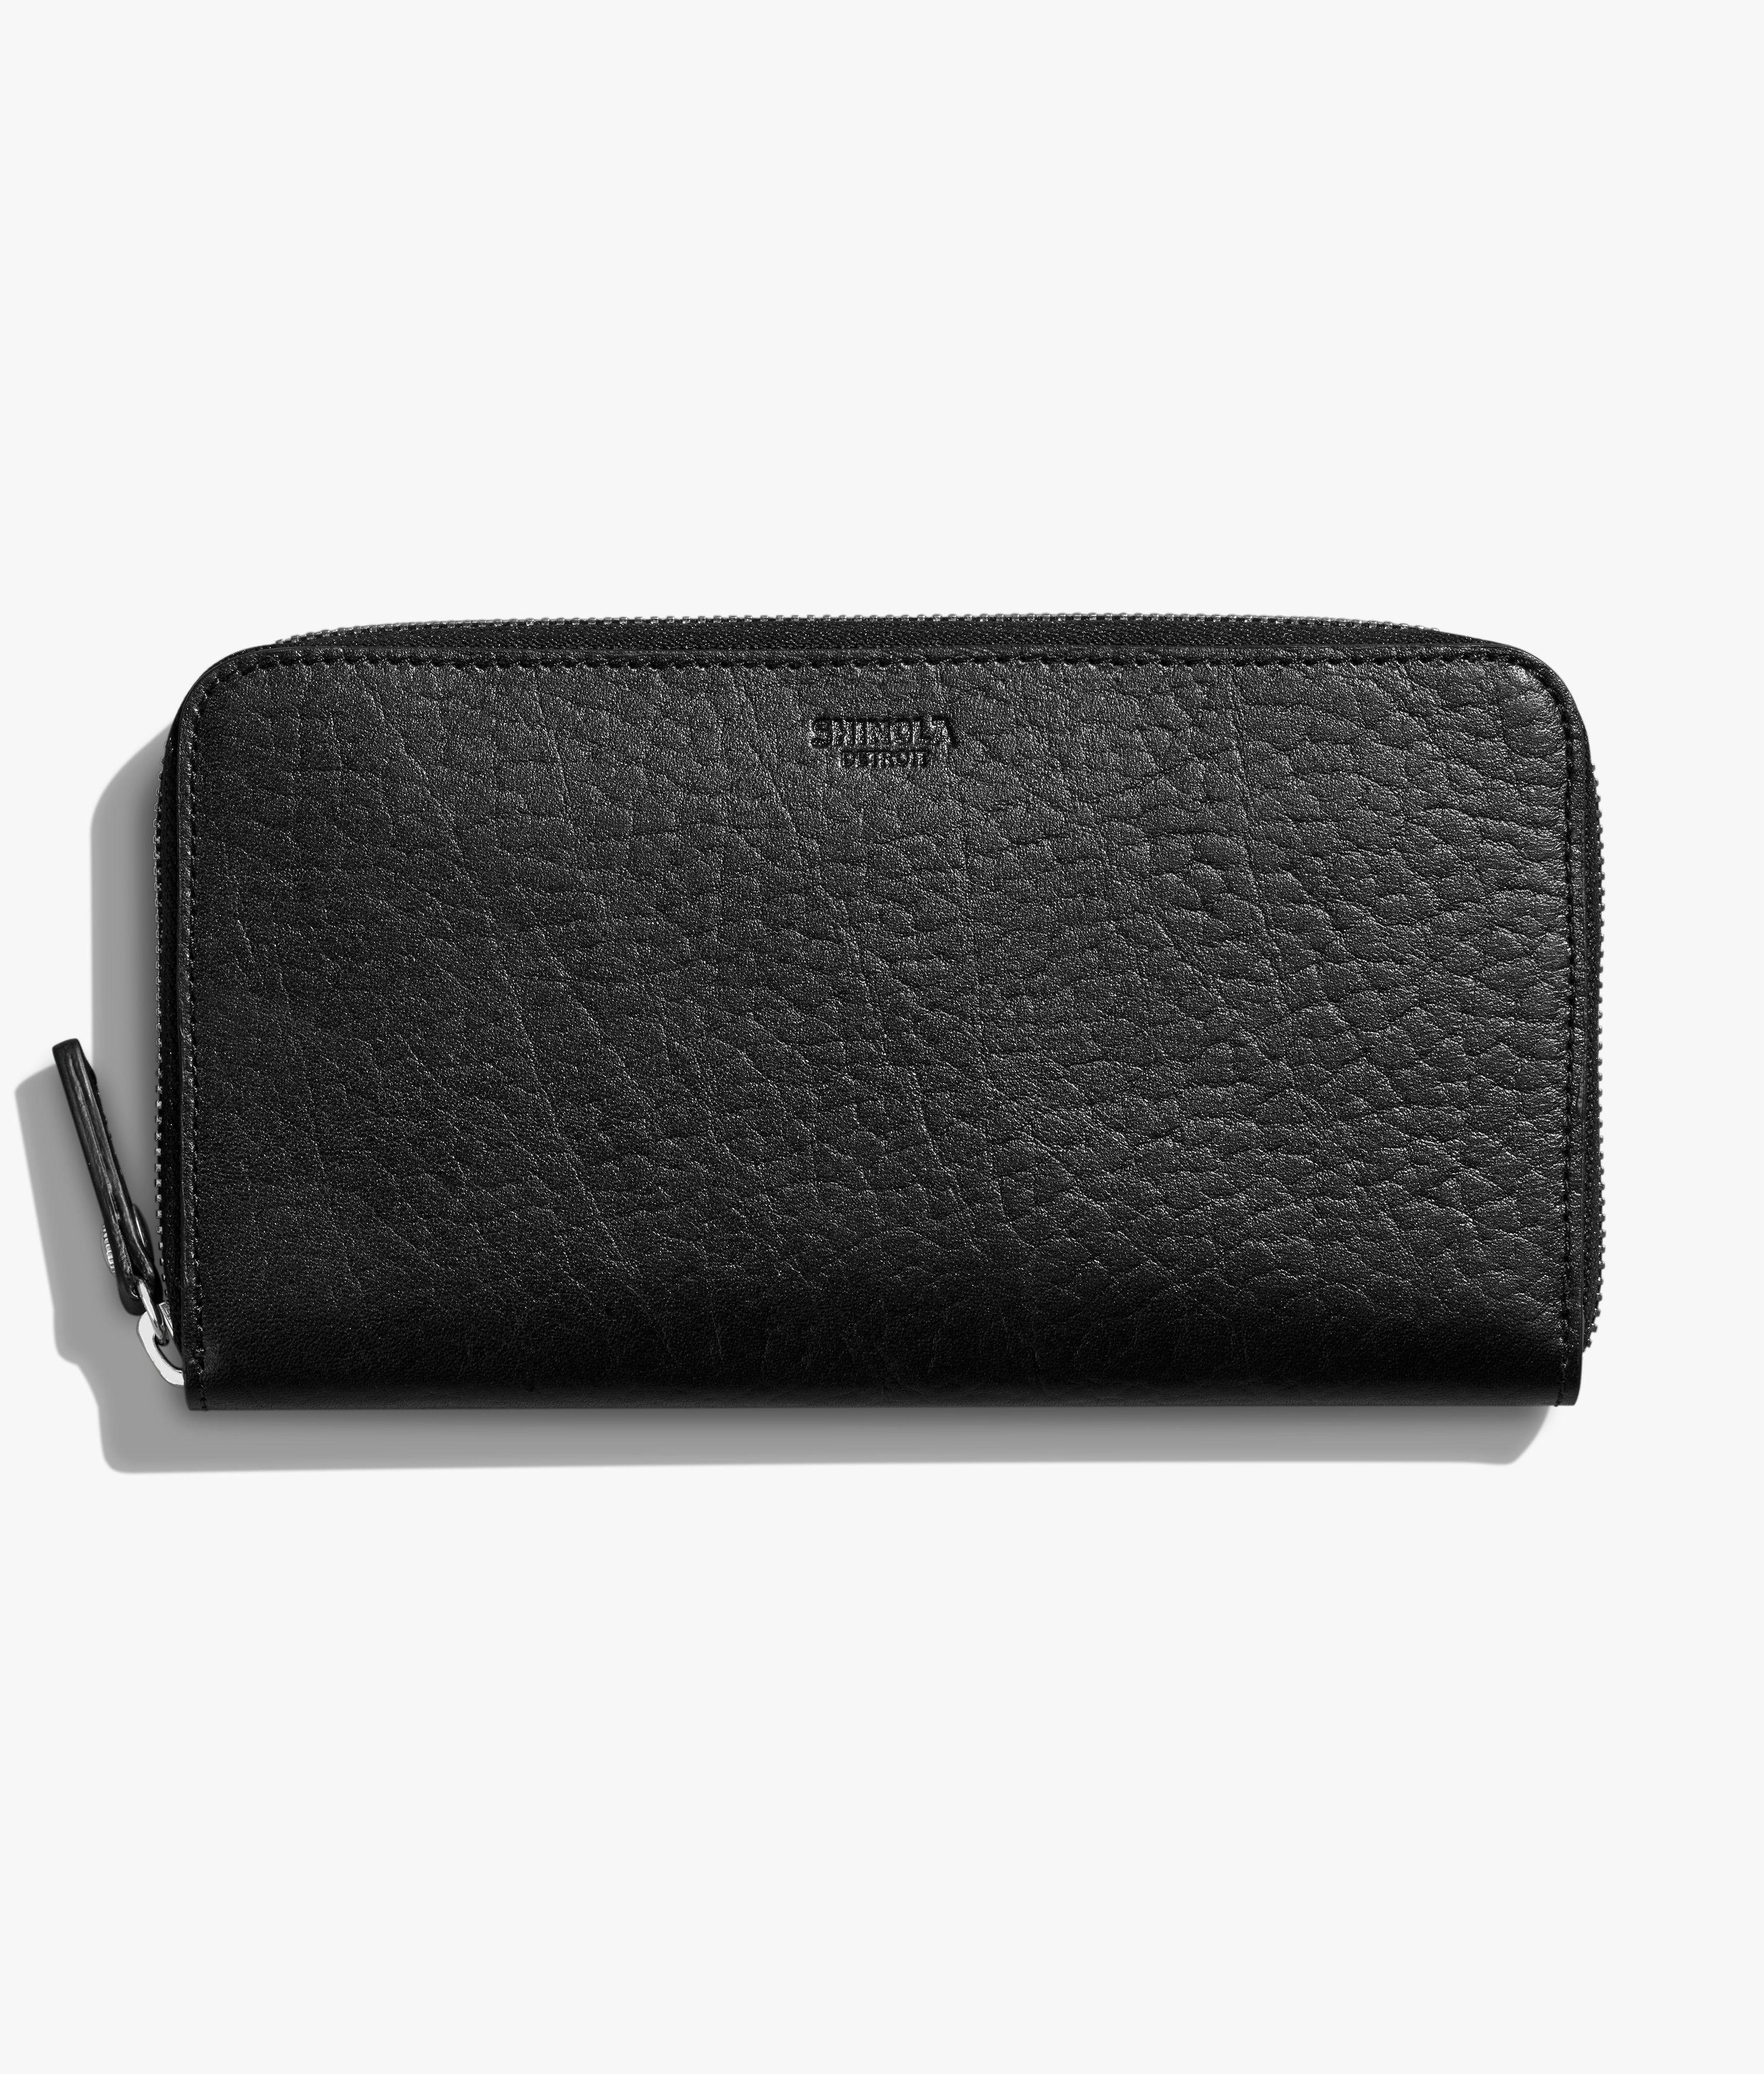 7f96dbce799f Women s Leather Wallet - Zip Continental Wallet